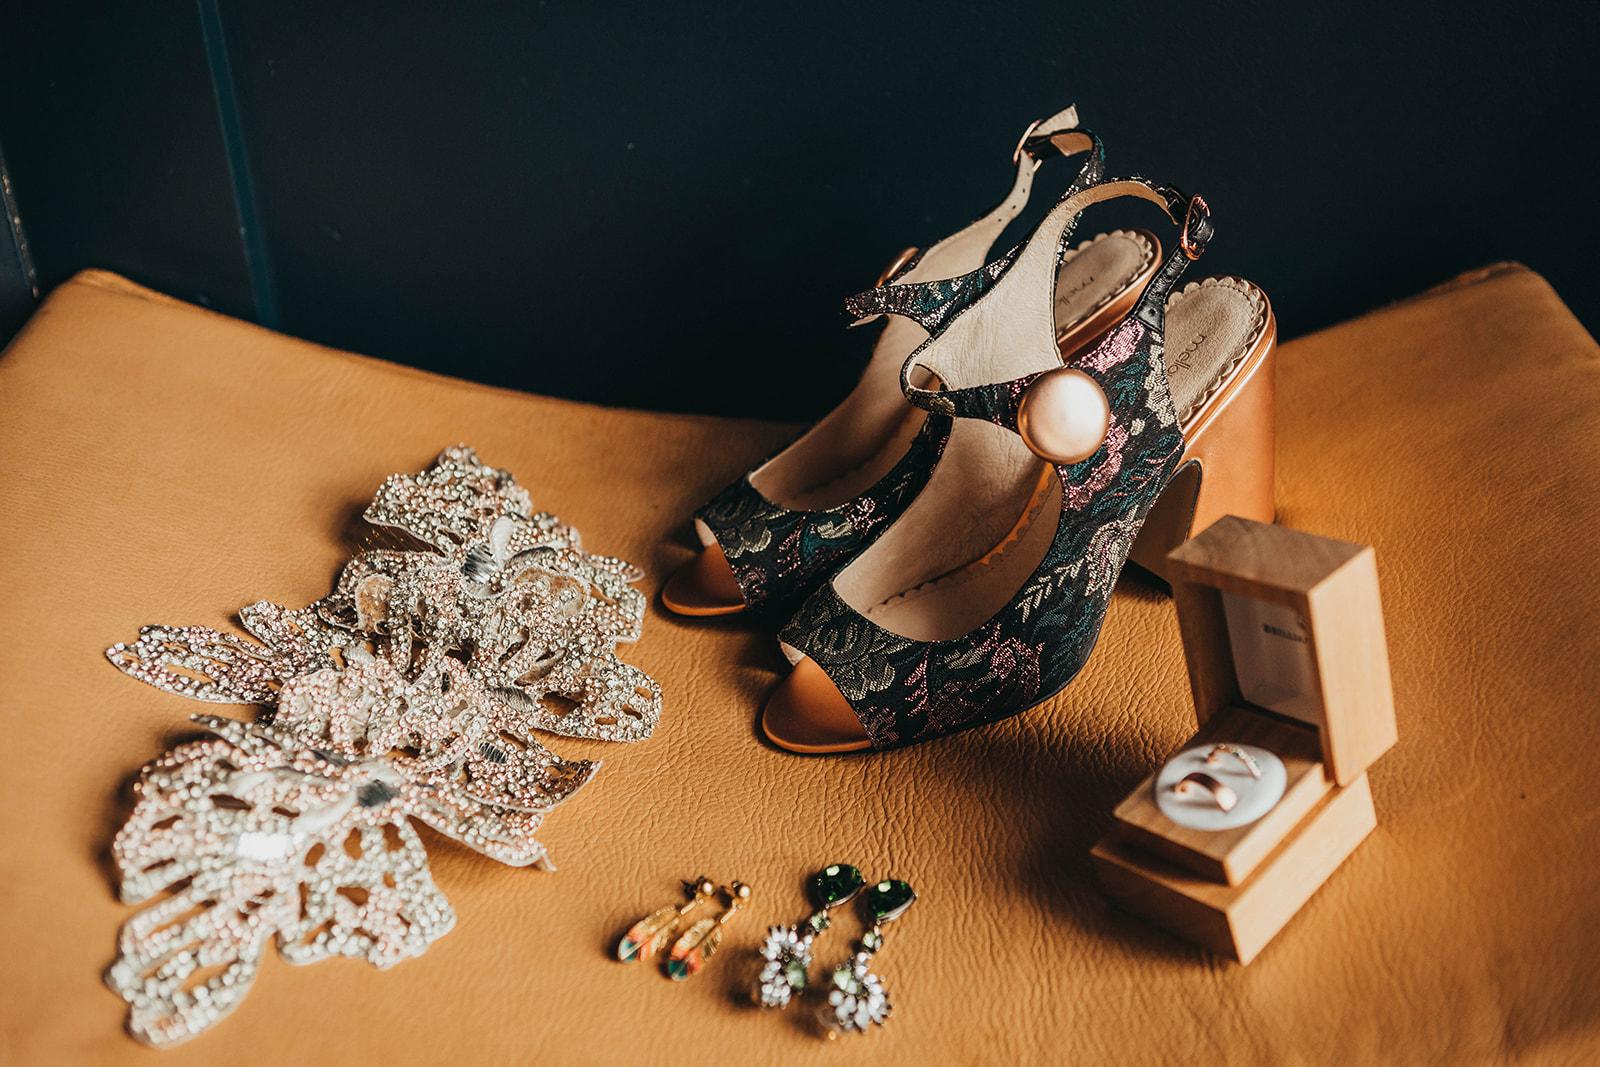 Blush, rose, gold wedding gown with butterflies, victorian bridal trend, nyc wedding gown designer.jpg